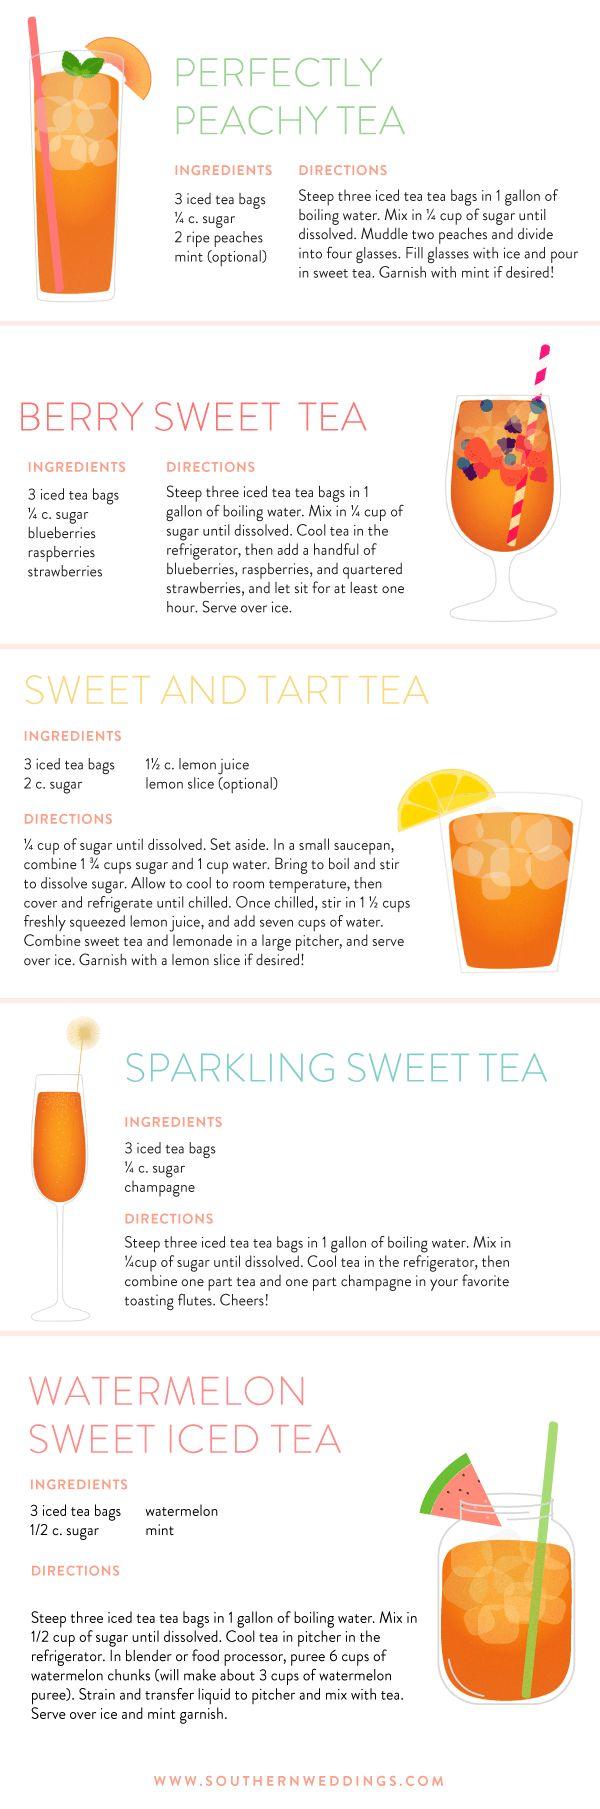 Sweet Iced Tea Recipes from SouthernWeddings.com http://southernweddings.com/2016/08/19/gracious-hostess-sweet-tea-recipe-round-up/